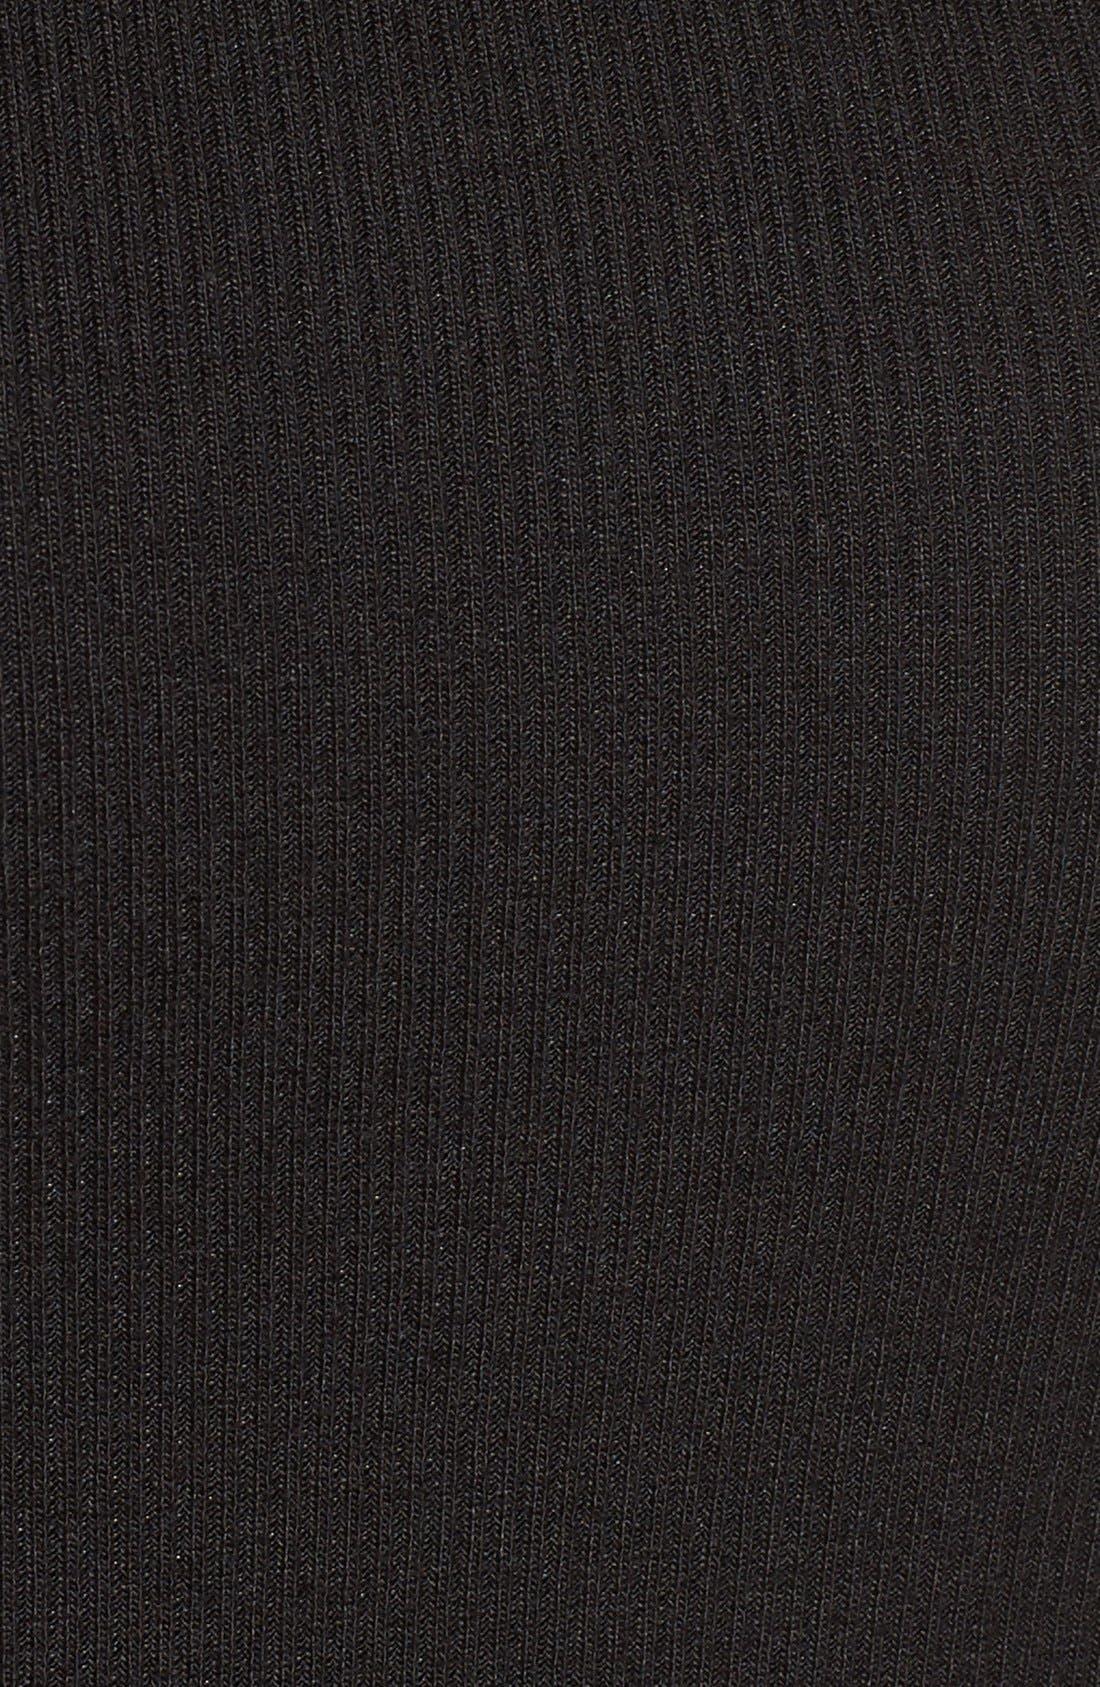 Alternate Image 5  - Amuse Society 'Awaken' Side Cutout Ribbed Crop Top